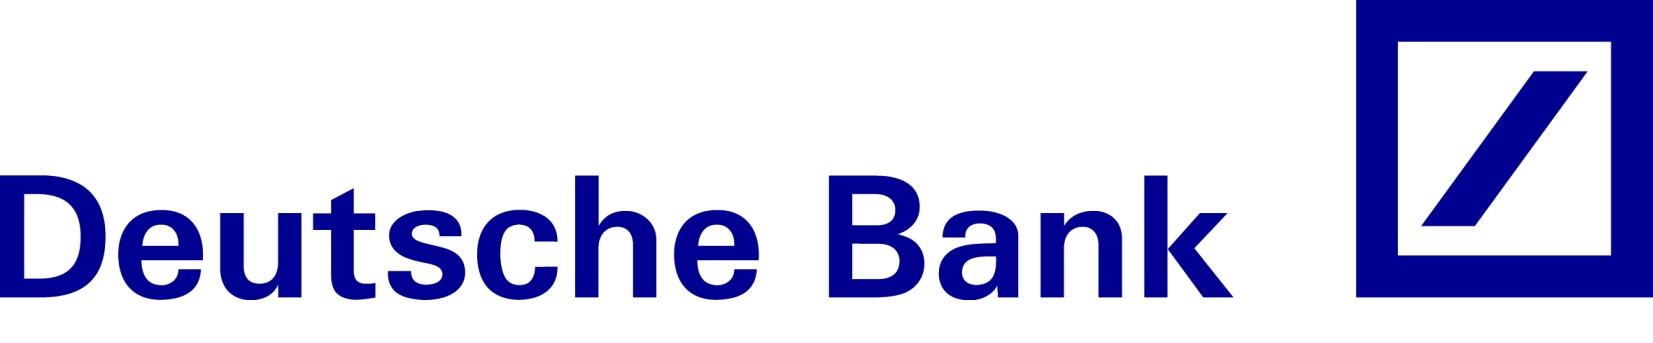 Deutsche Bank vrši reprivatizaciju Hypo banke u Jugoistočnoj Evropi